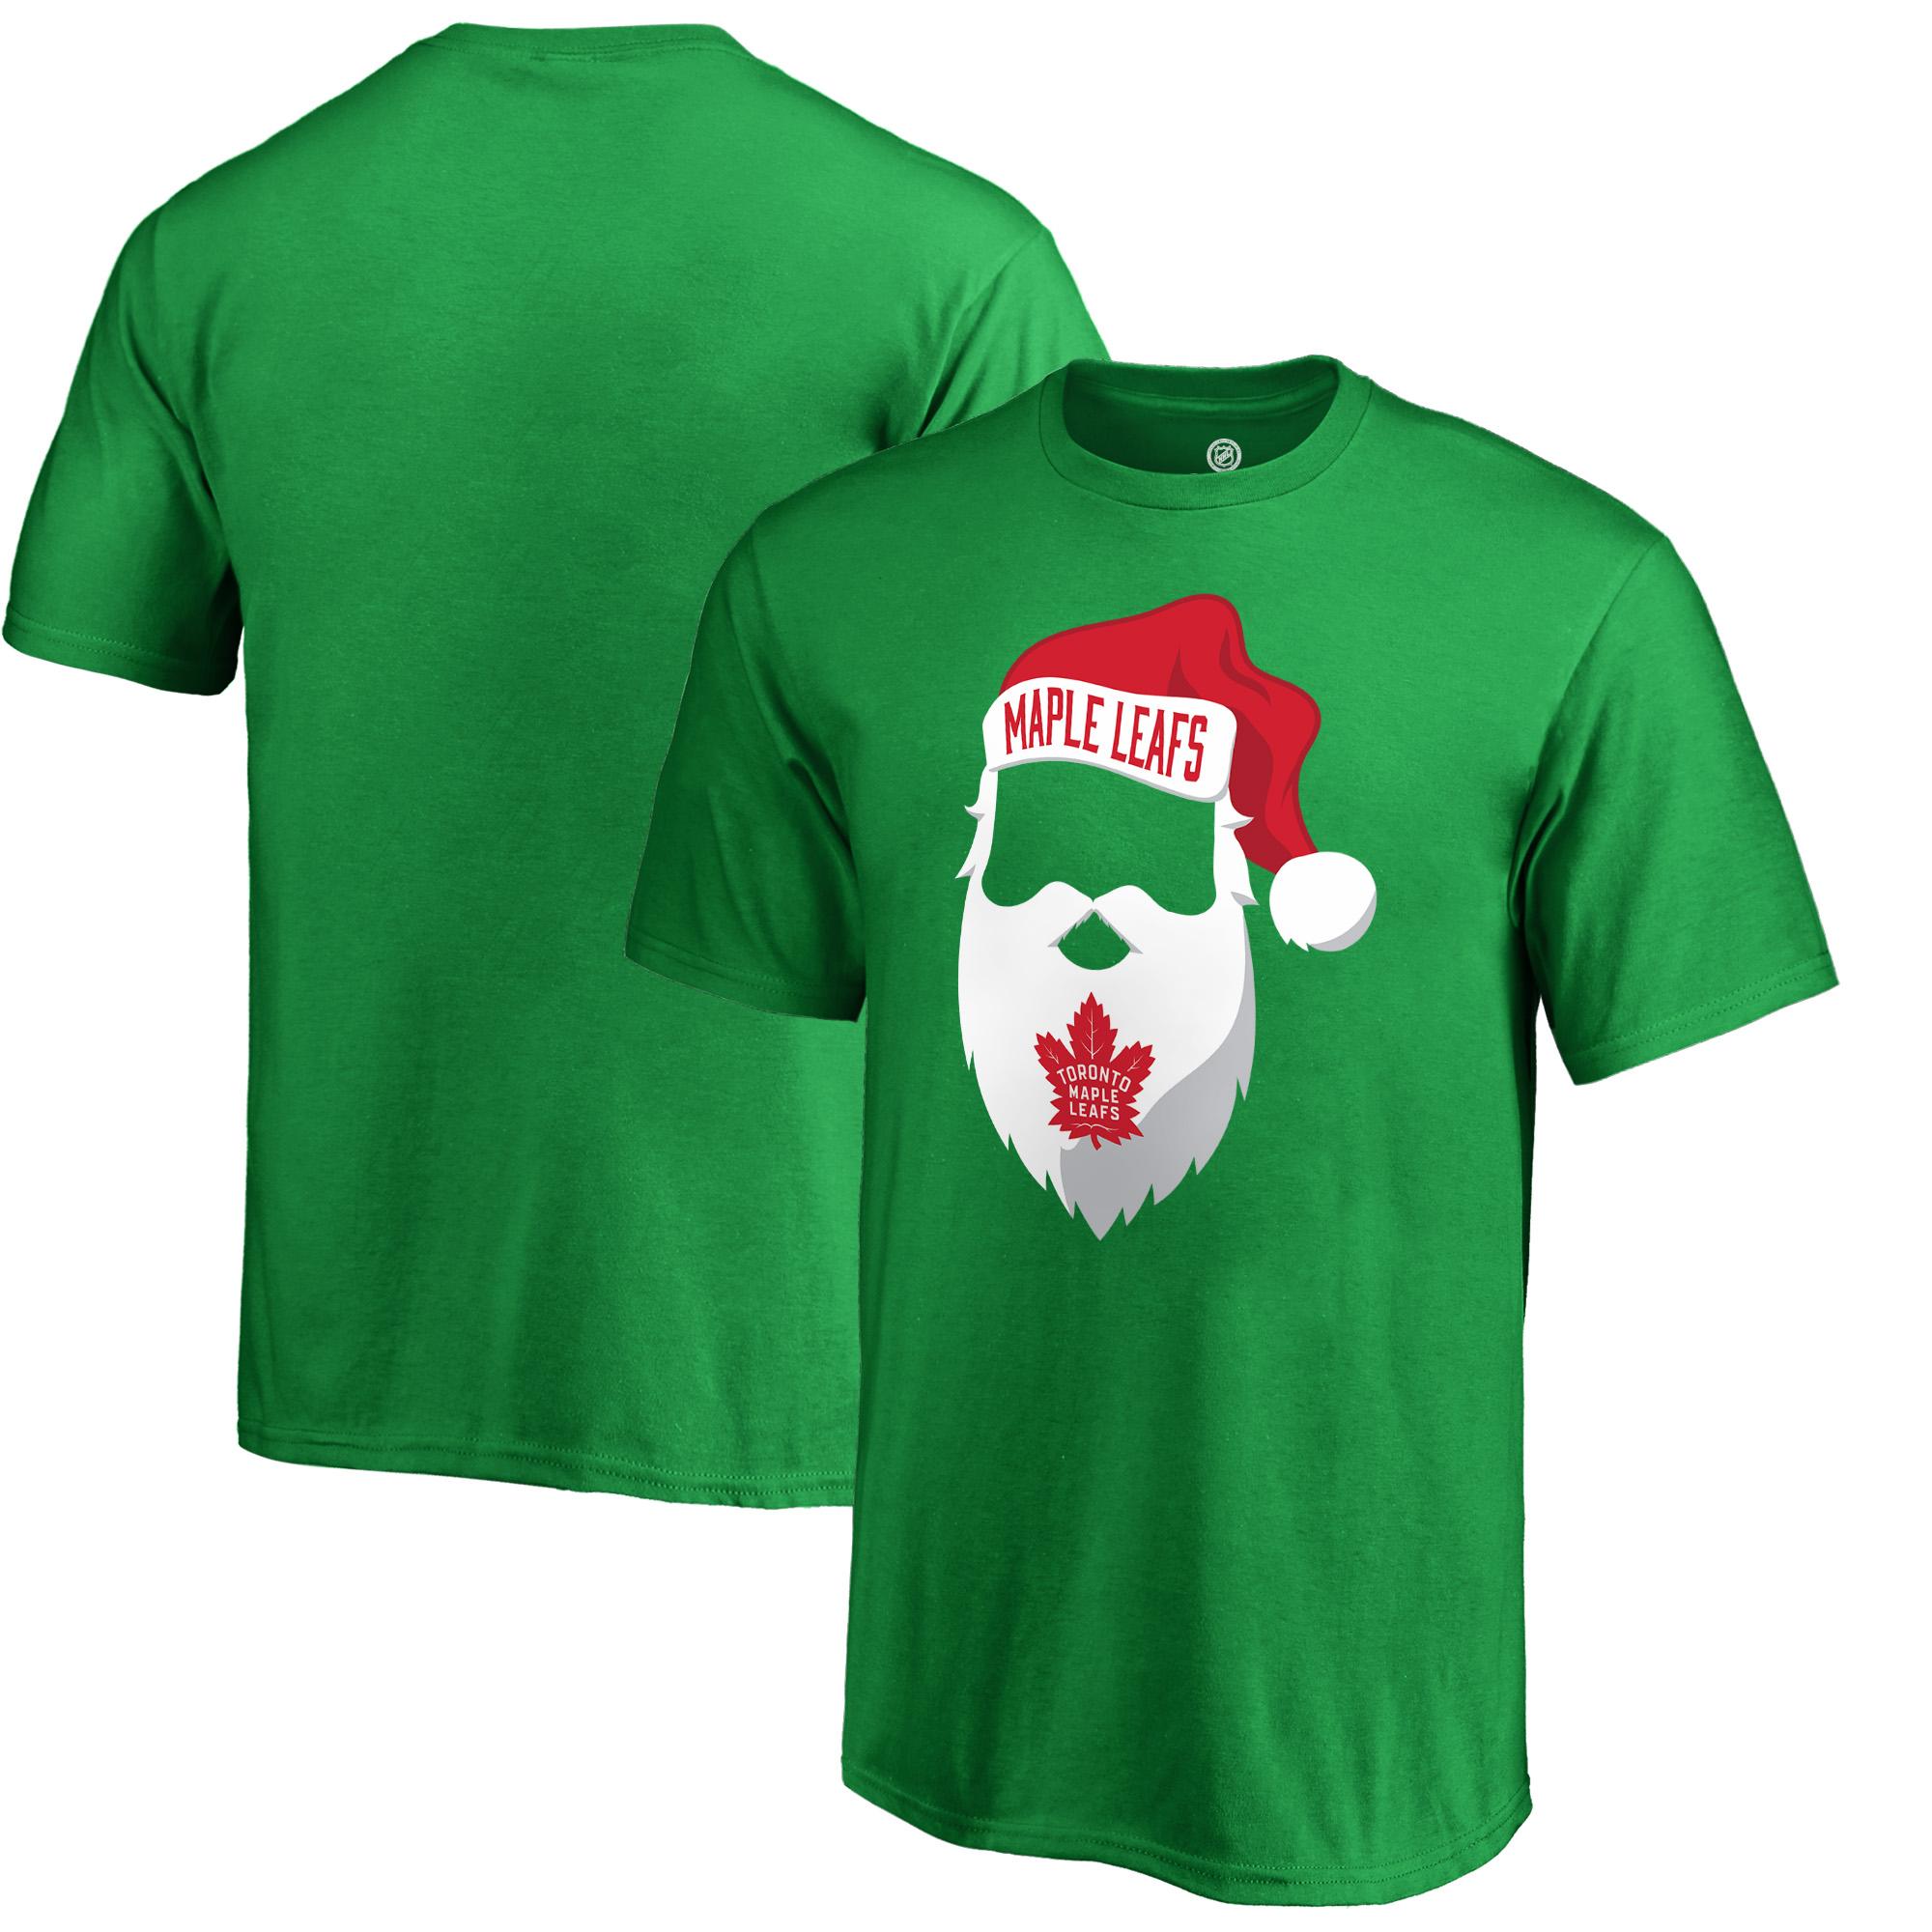 Toronto Maple Leafs Fanatics Branded Youth Jolly T-Shirt - Kelly Green